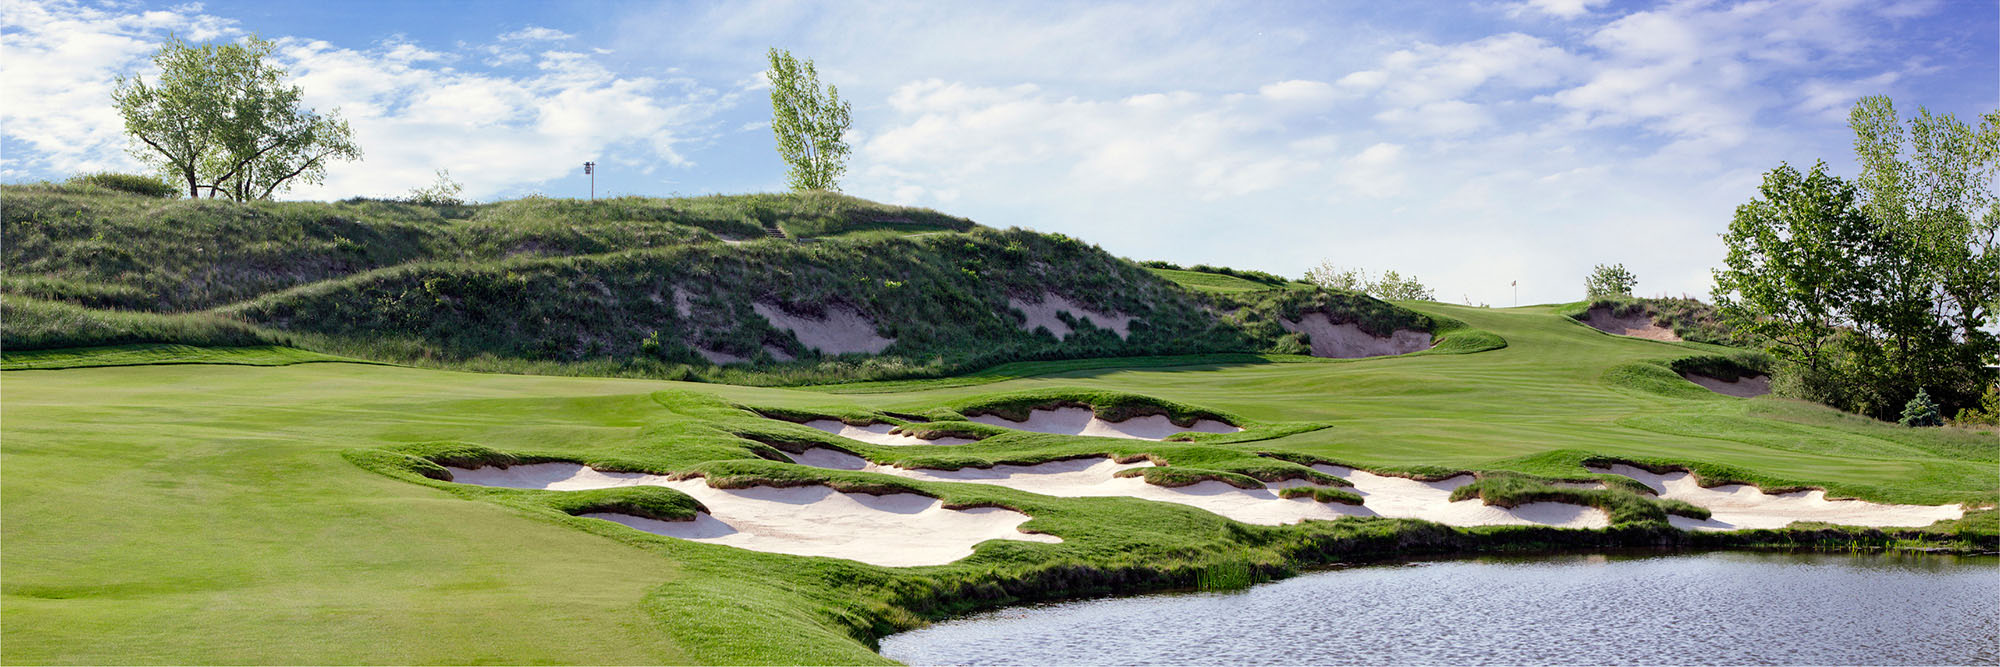 Golf Course Image - Harbor Shores No. 7